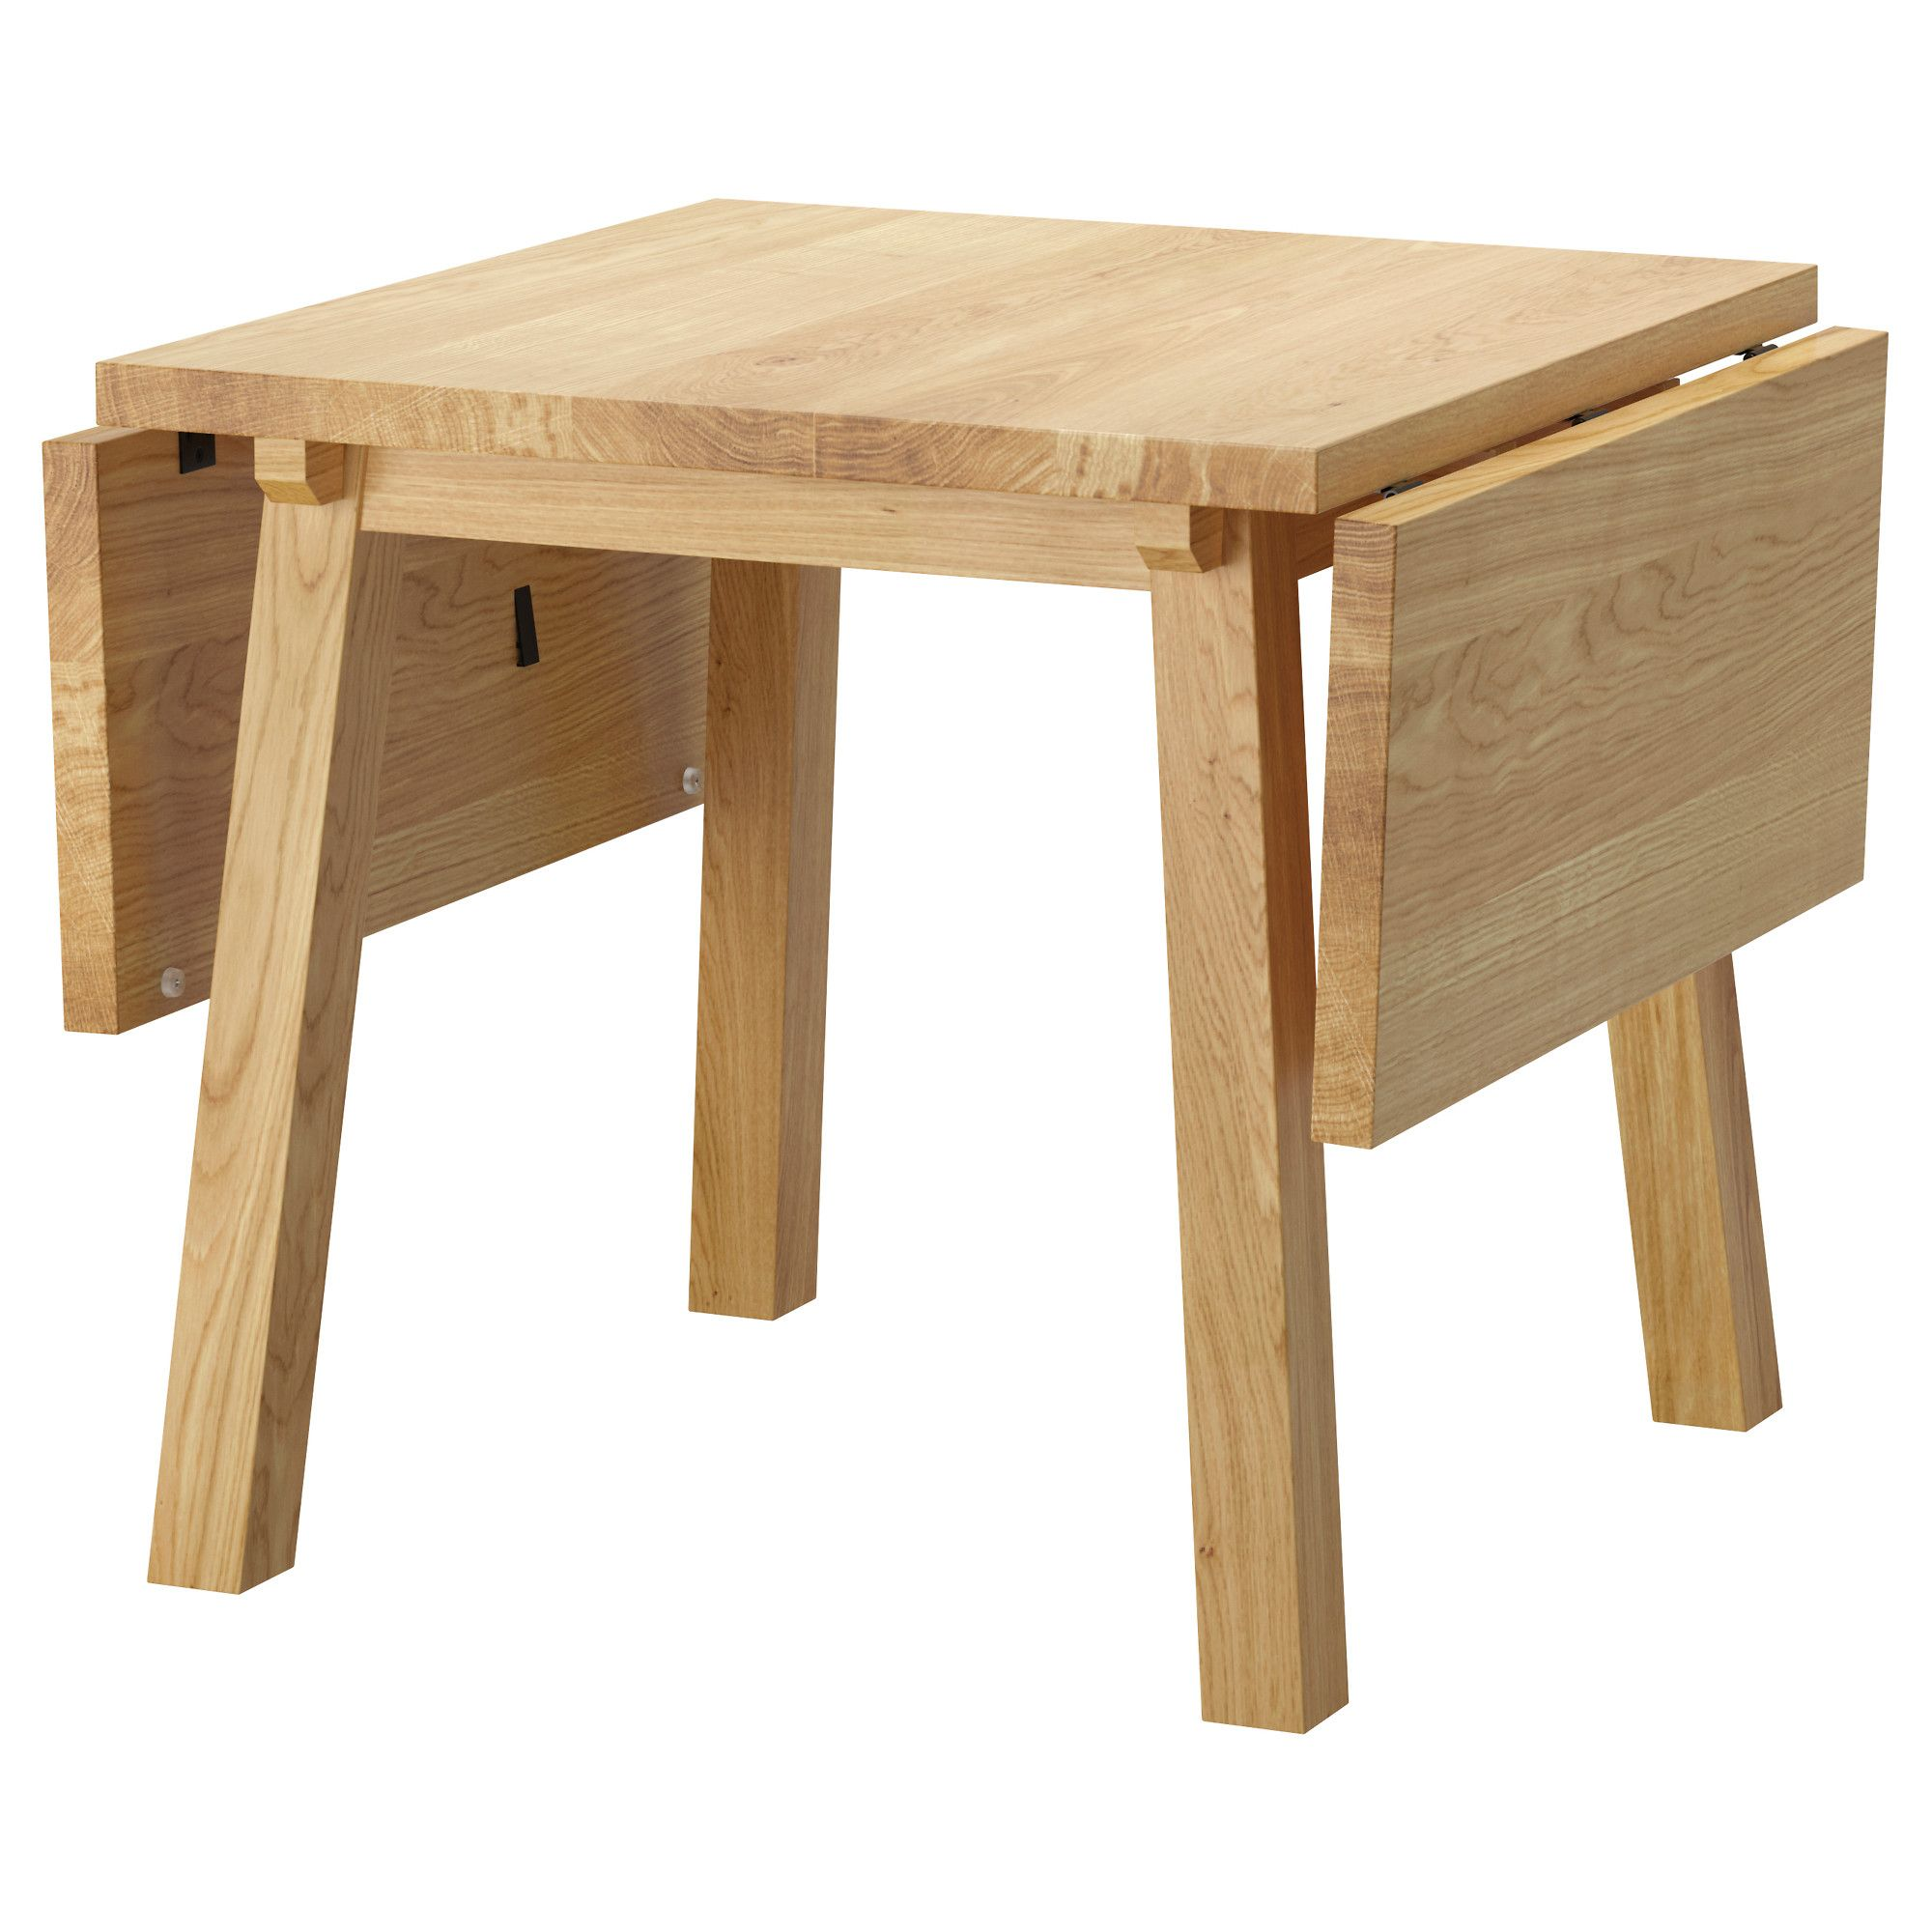 Ikea Us Furniture And Home Furnishings Drop Leaf Table Ikea